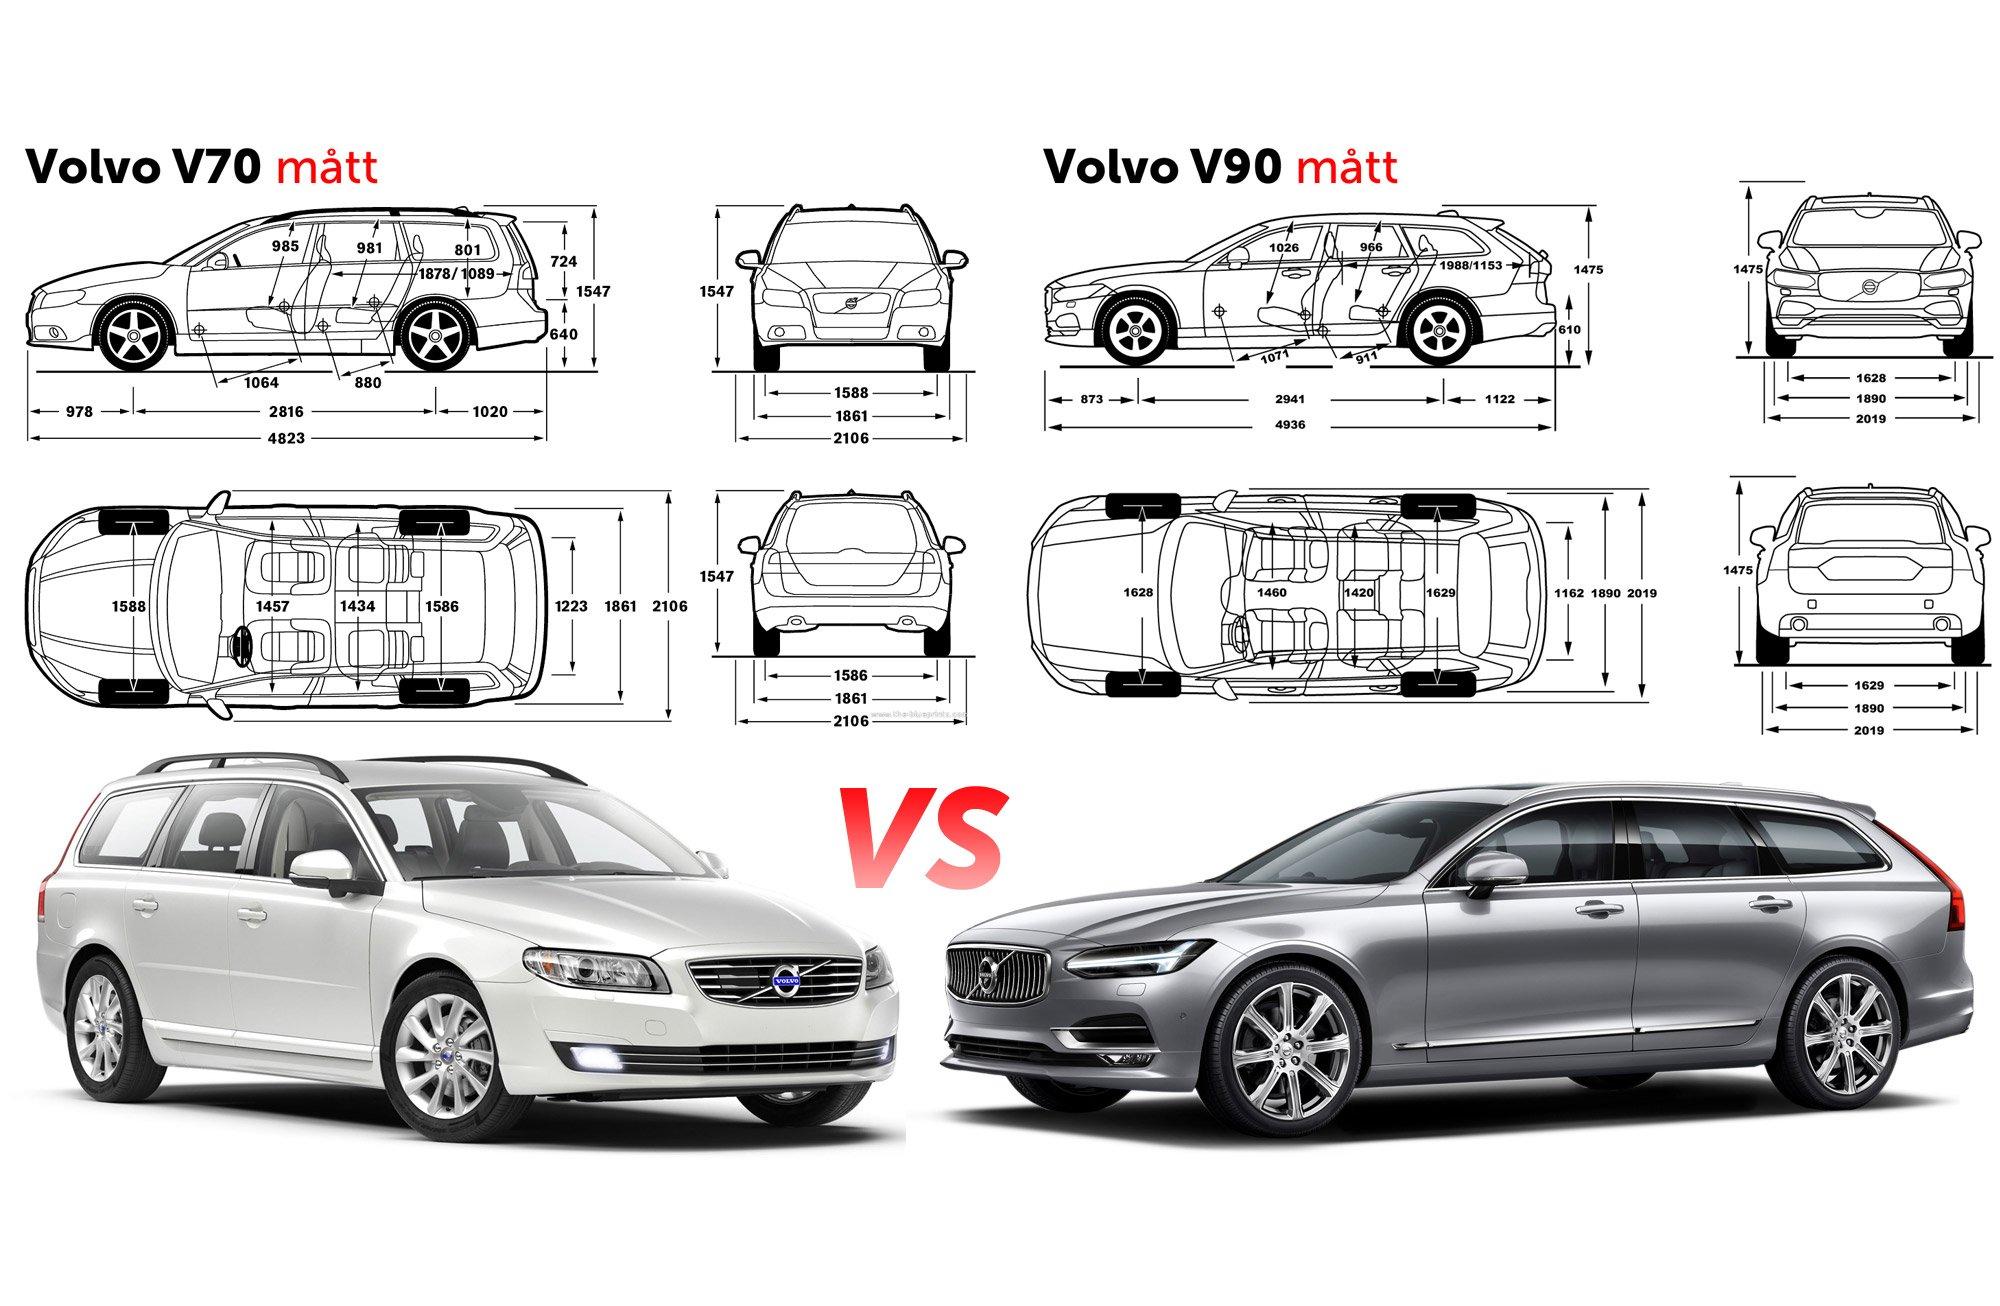 "Teknikens Värld on Twitter: ""Volvo V90 vs Volvo V70 - all measurements, side by side https://t ..."